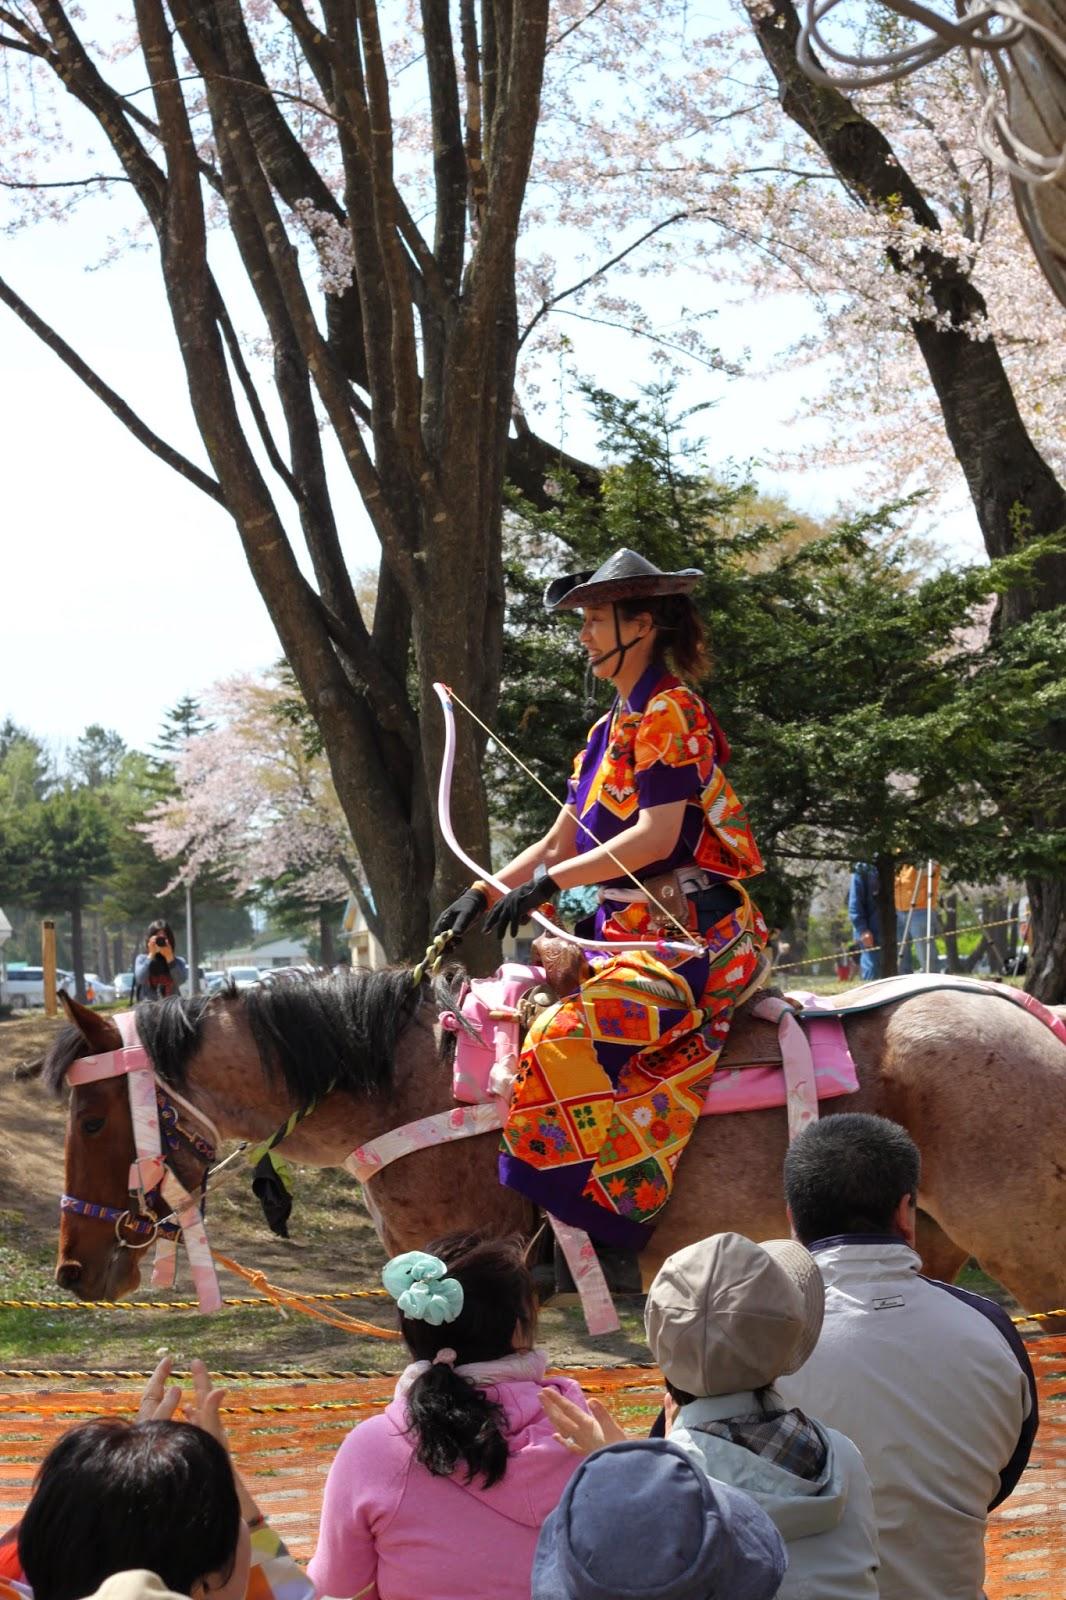 Towada Horseback Archery Sakura Yabusame 十和田市 2015桜流鏑馬